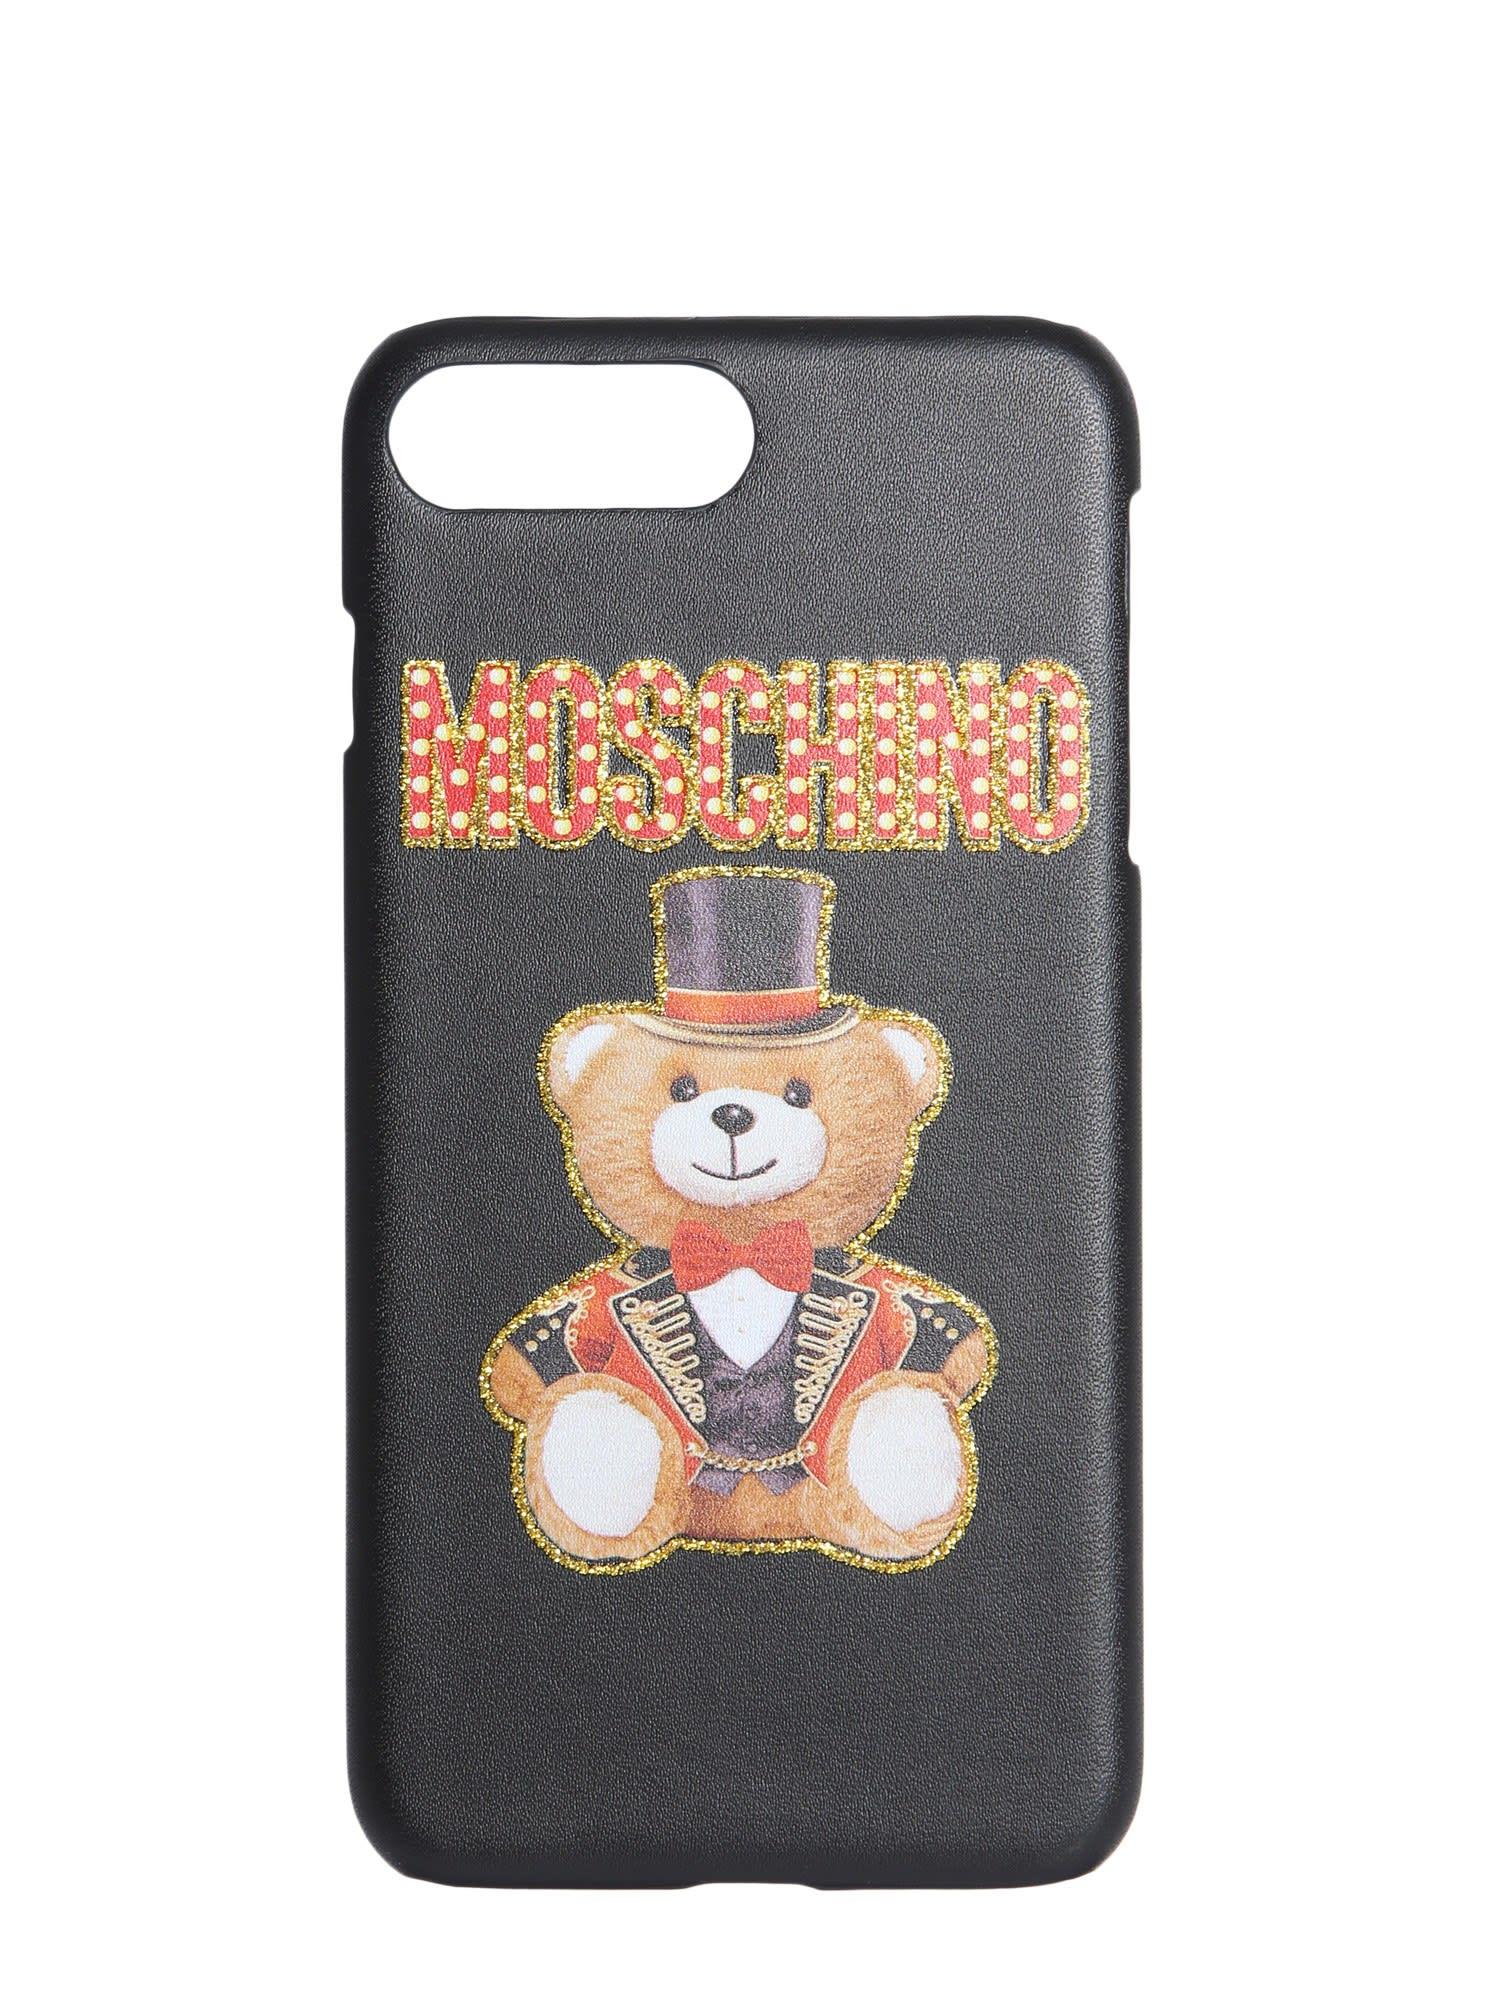 nuovo di zecca afef3 d36c2 Moschino Iphone 6 / 6s / 7 Plus / 8 Plus Cover